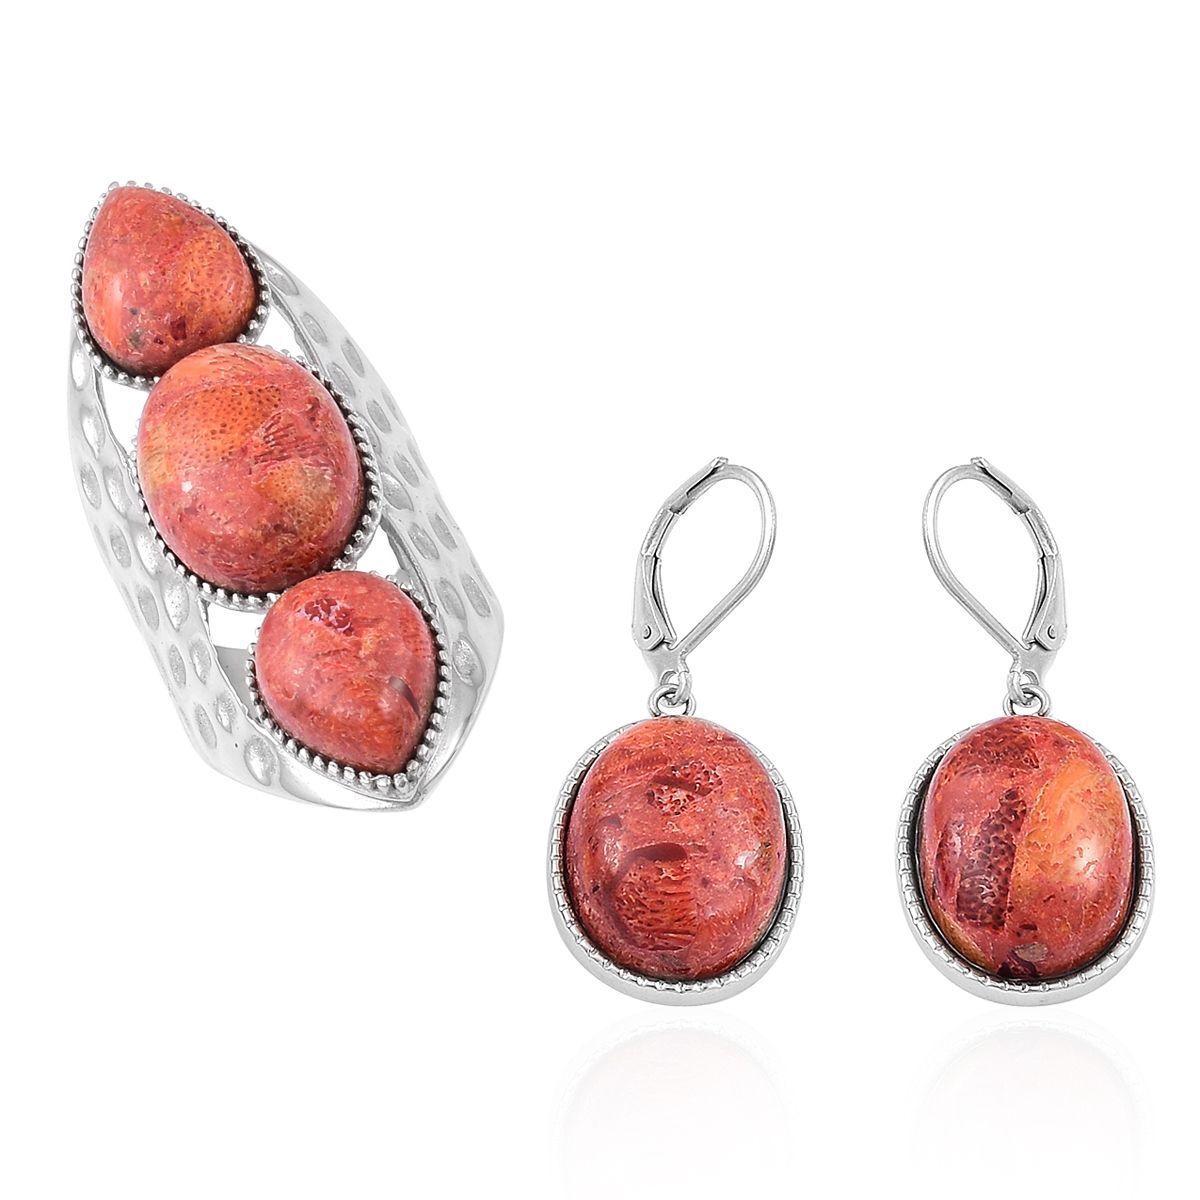 NIB  69.99 Size 5 Sponge Coral Elongated Ring & Earrings (40.000 Cts) Set N-29